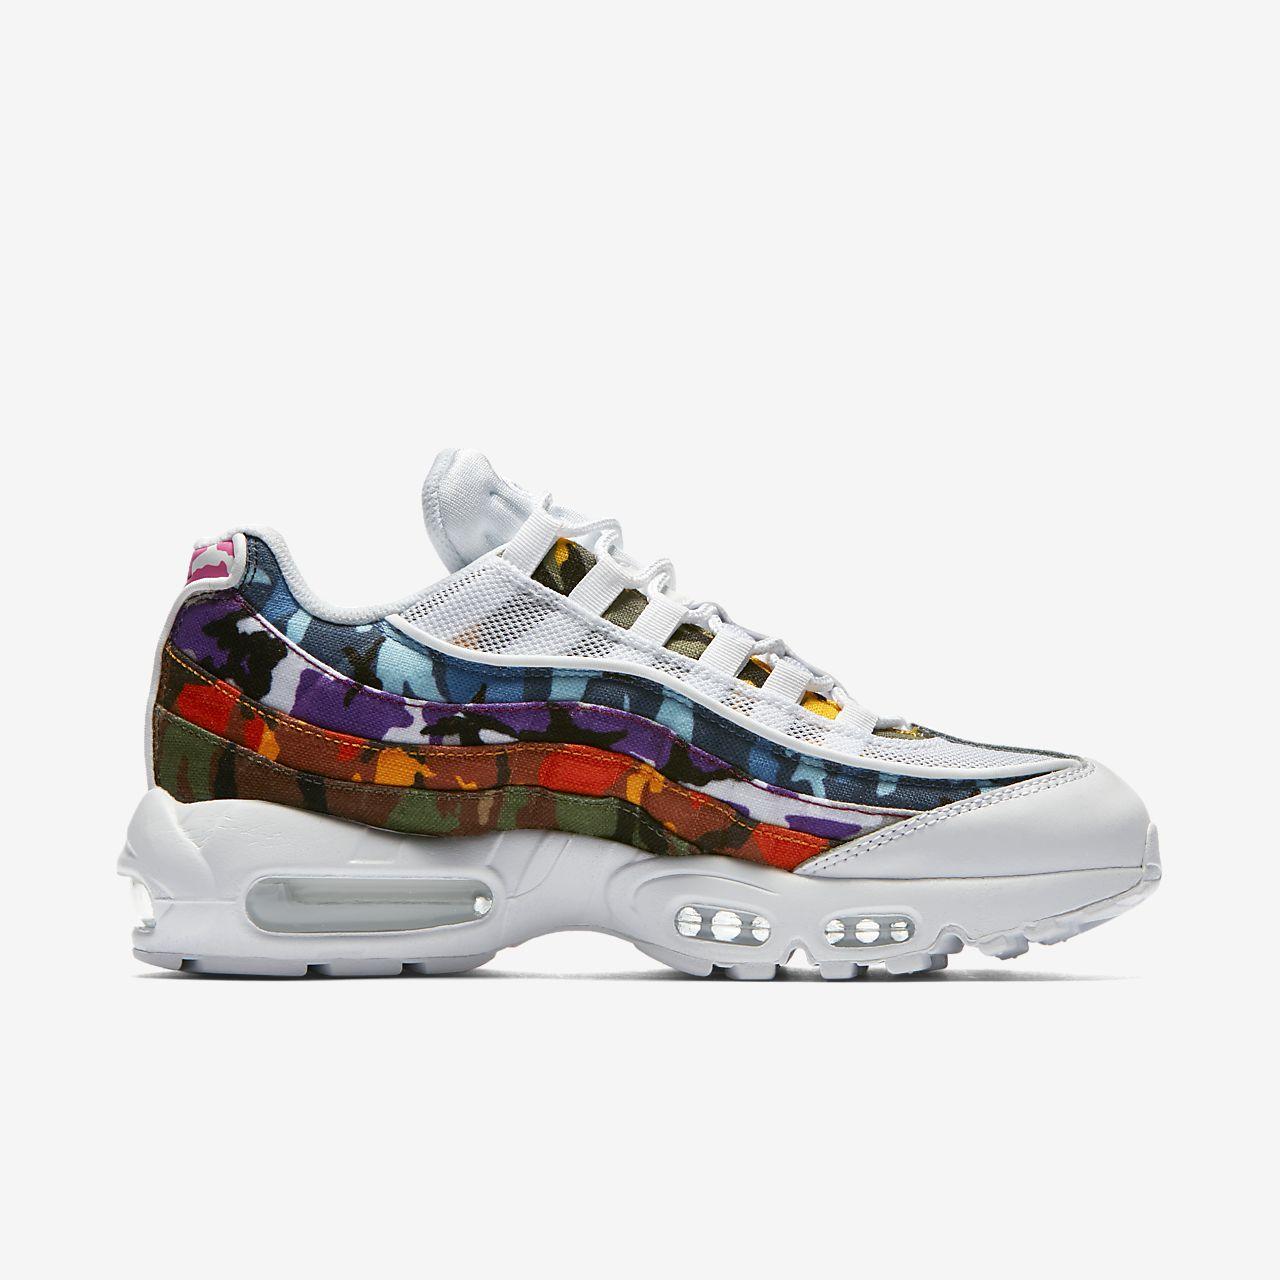 Nike Air Max 95 OG MC SP Men's Shoe